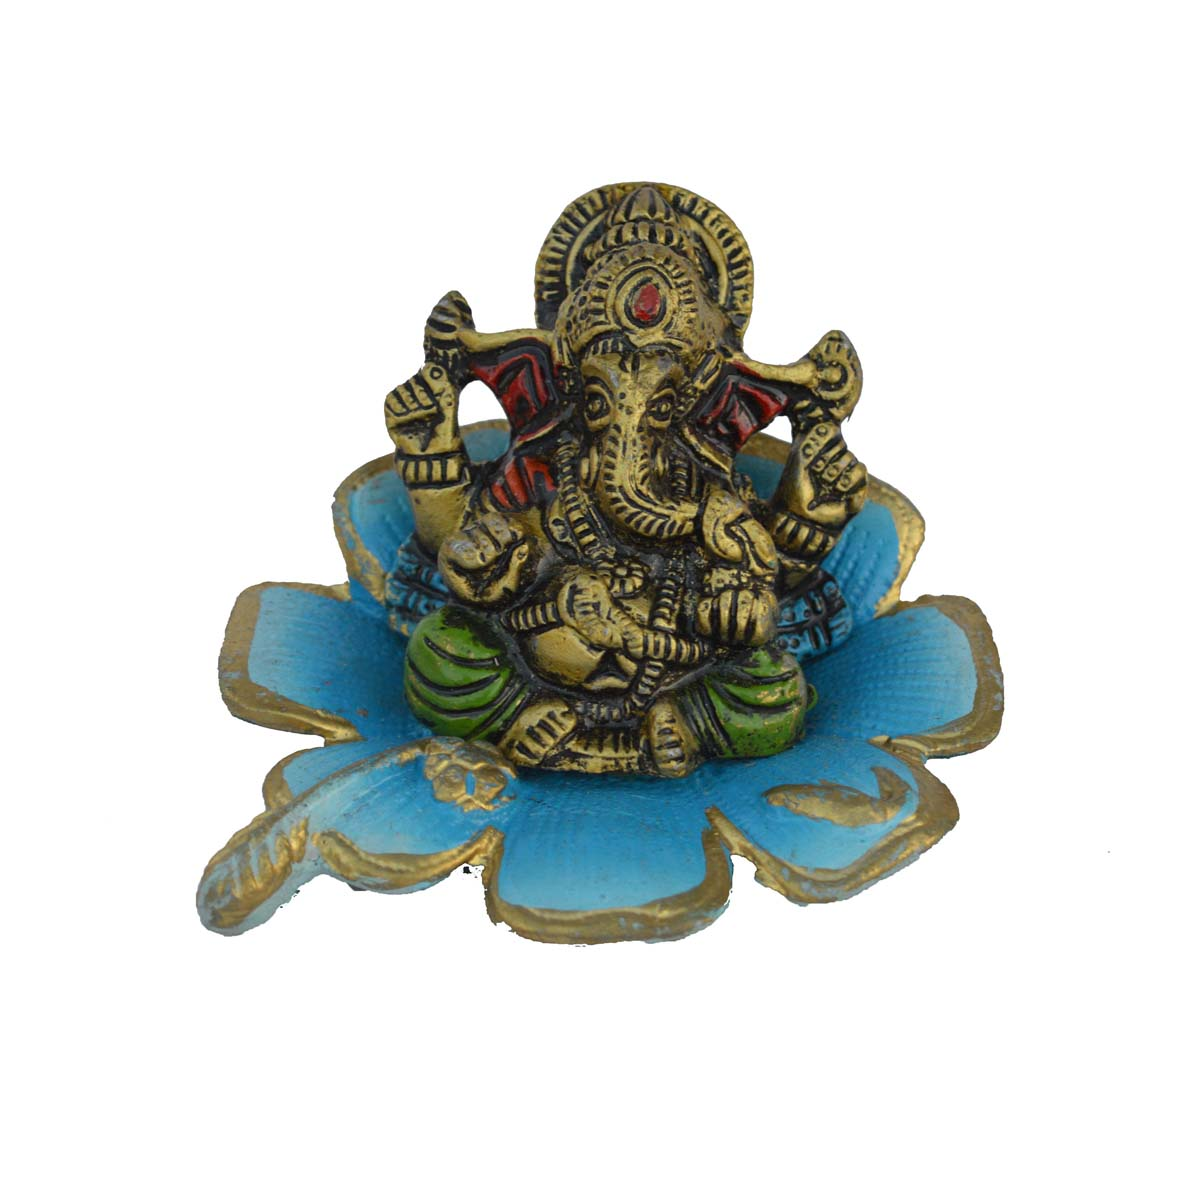 Metal Lord Ganesha Statue on Sky Blue Leaf Indian Home Decor